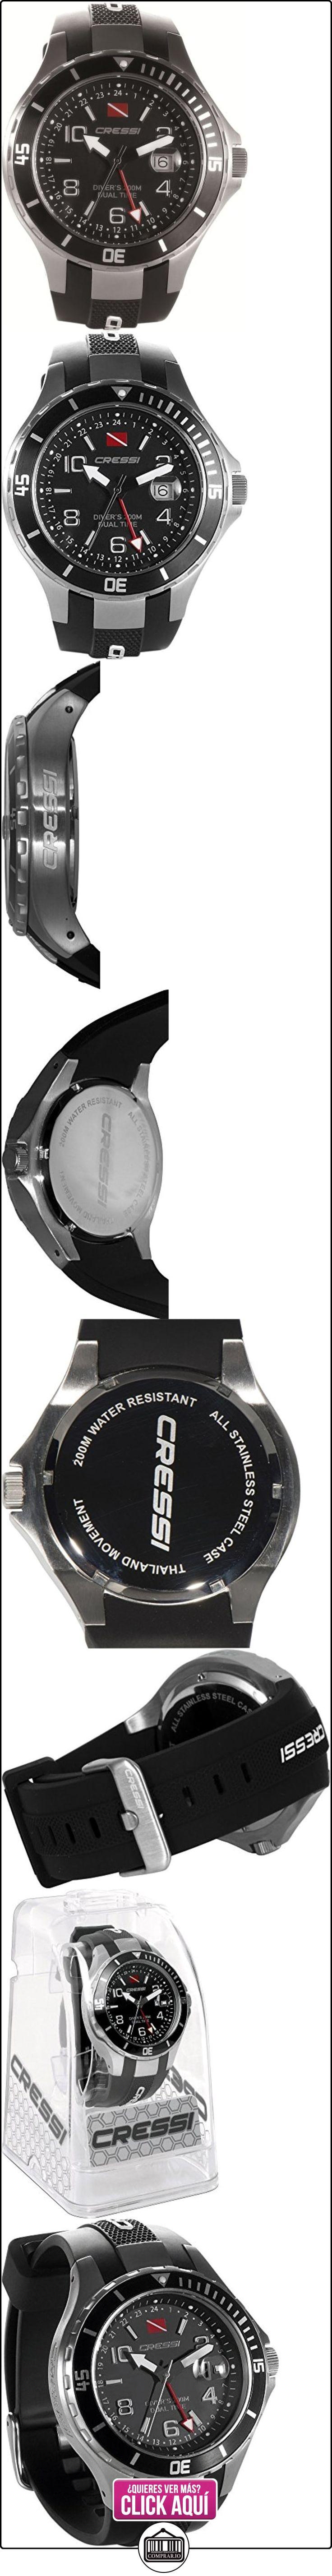 Cressi Dual - Reloj de buceo con doble huso horario, cristal mineral  ✿ Relojes para hombre - (Gama media/alta) ✿ ▬► Ver oferta: https://comprar.io/goto/B00HDQF7HU